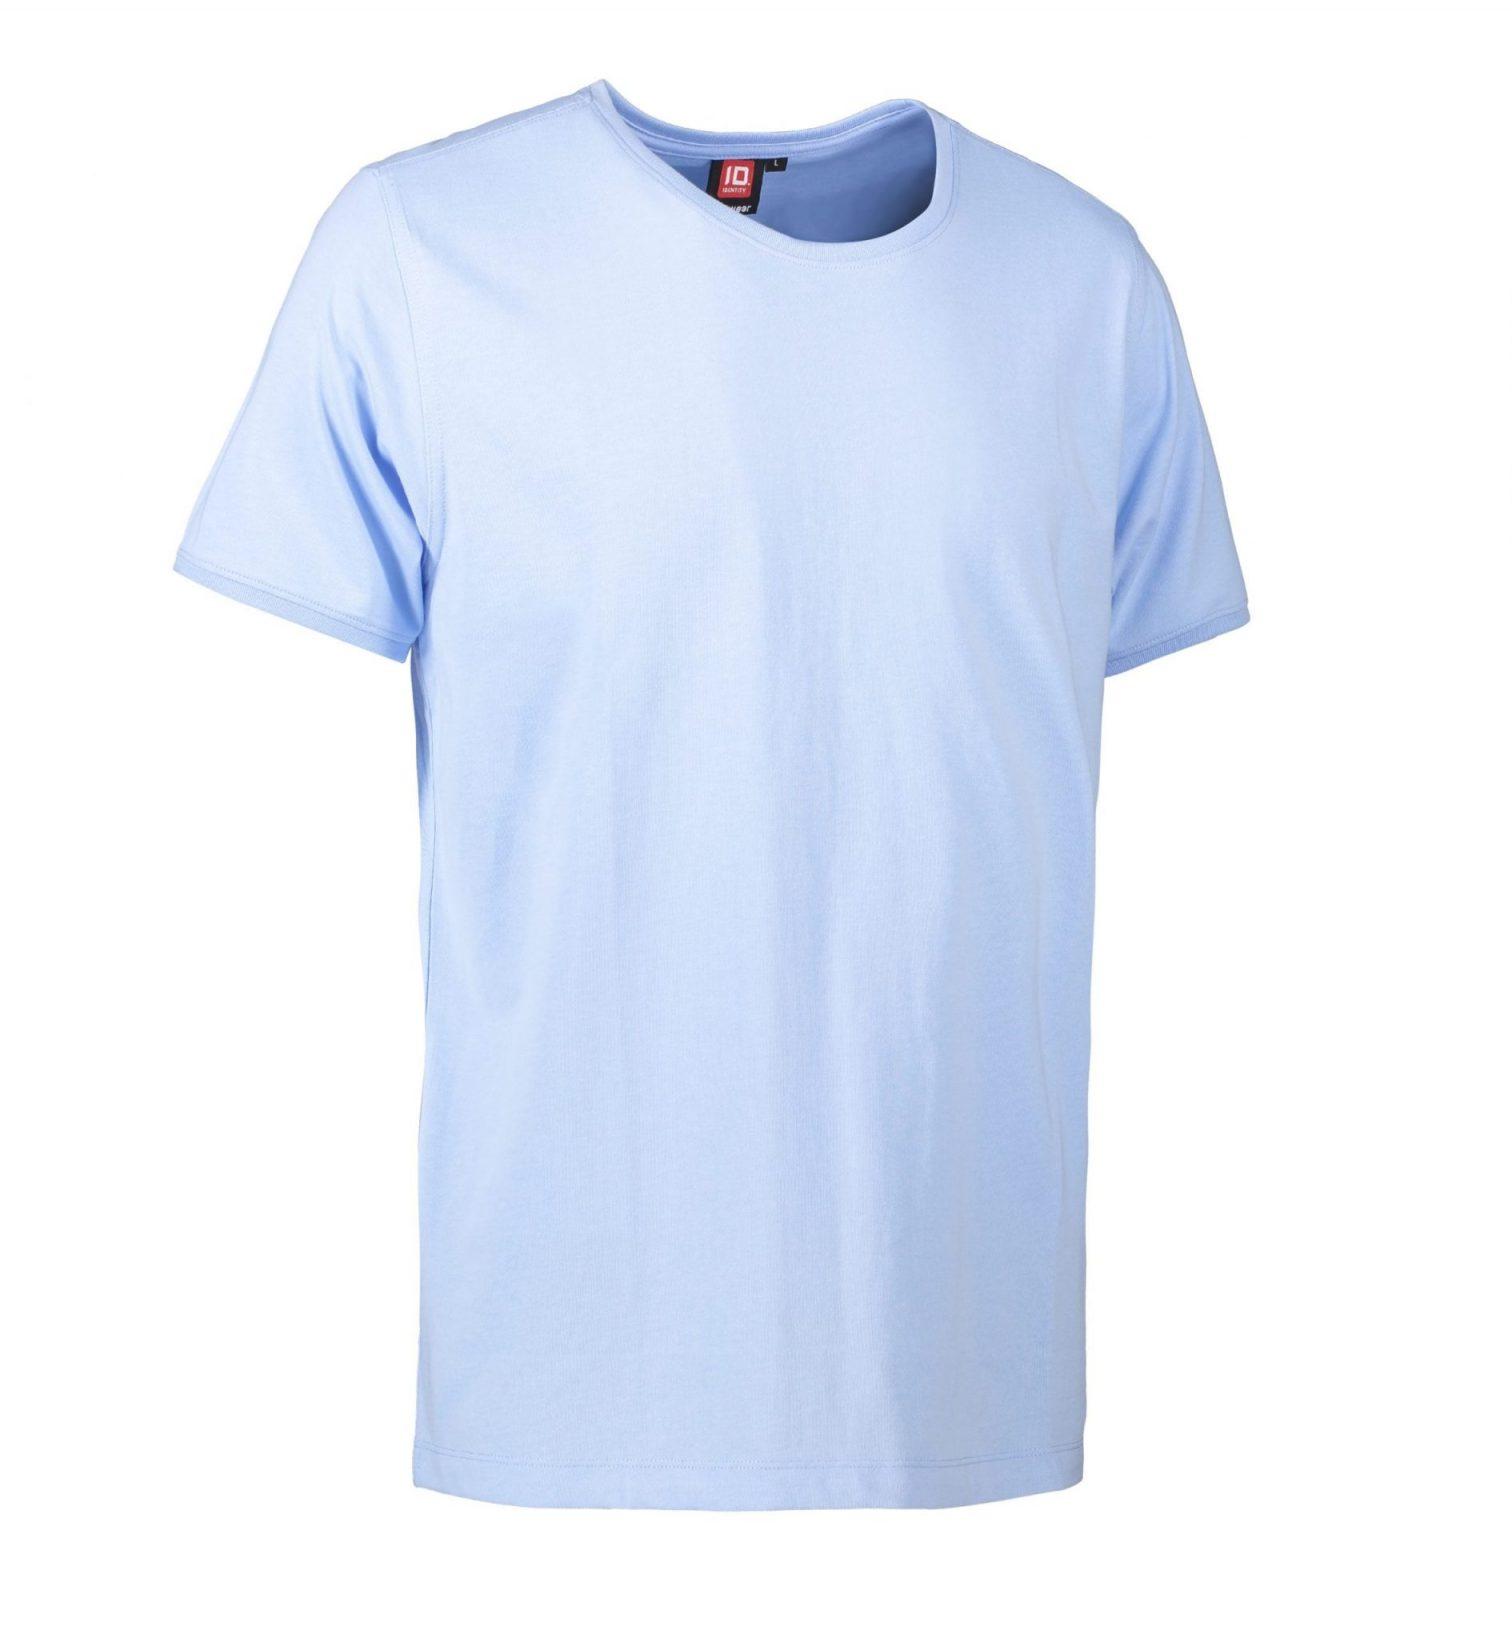 ID PRO Wear CARE T-shirt EU-Blomst certificeret herre lys blå